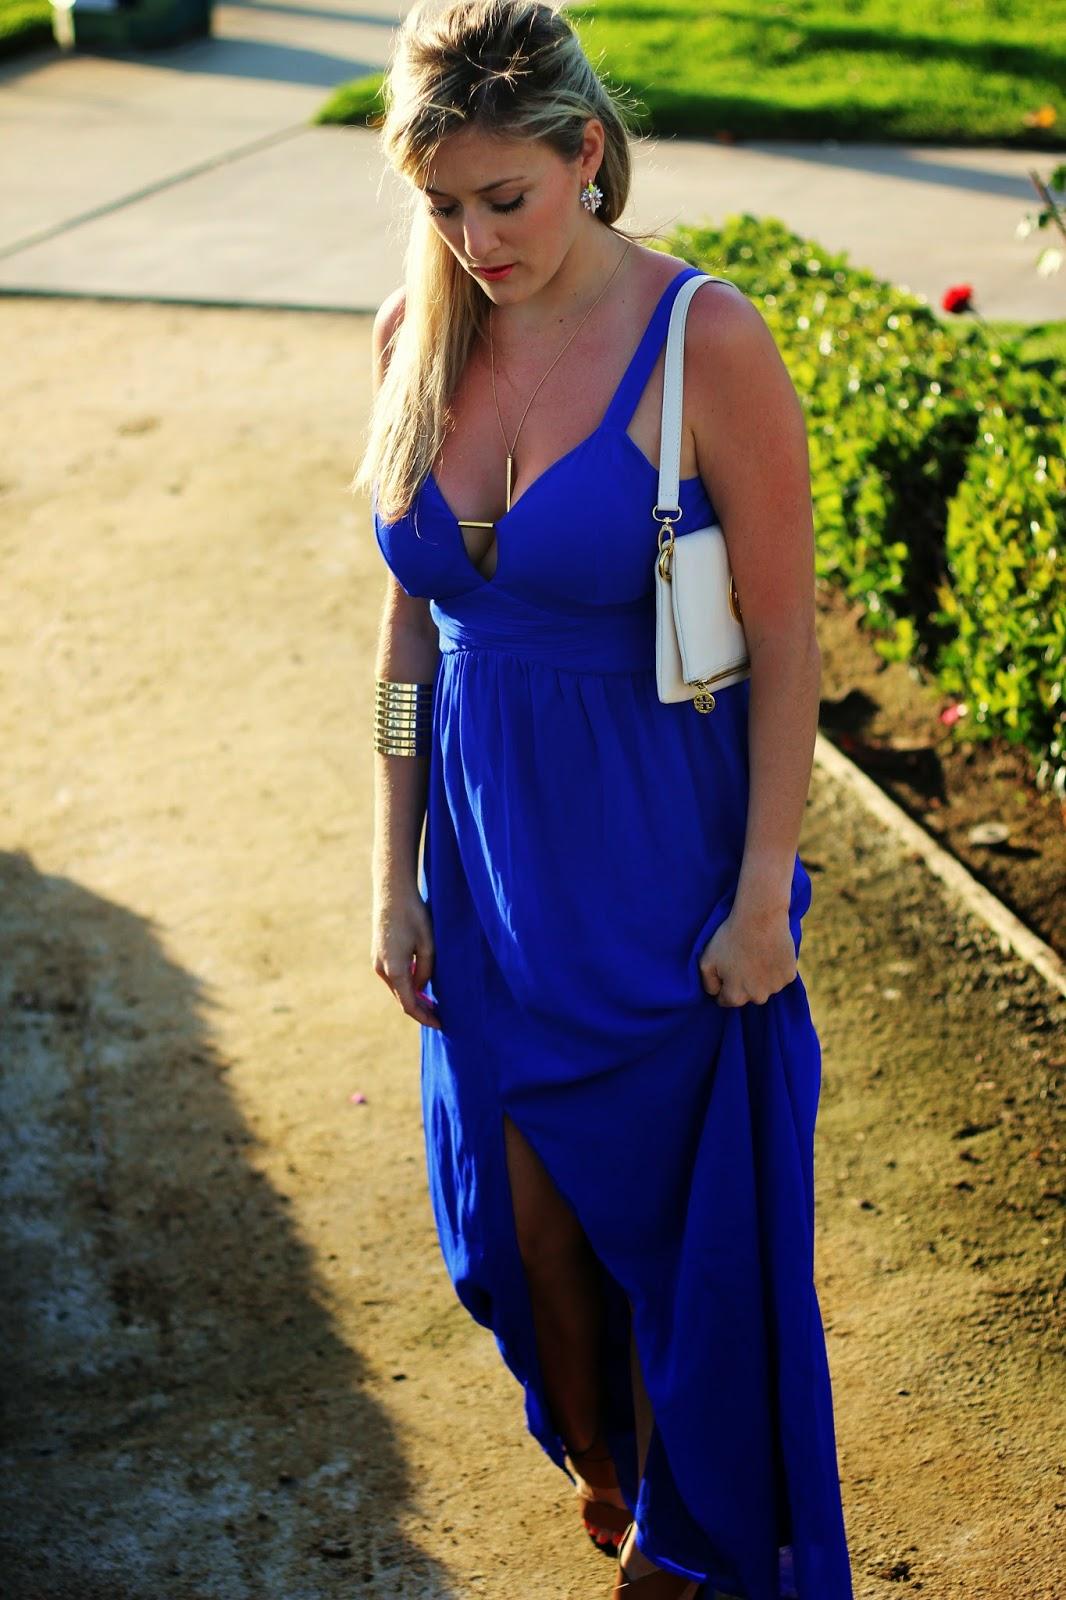 Wedding Guest Attire: Blue Maxi - She Said He Said